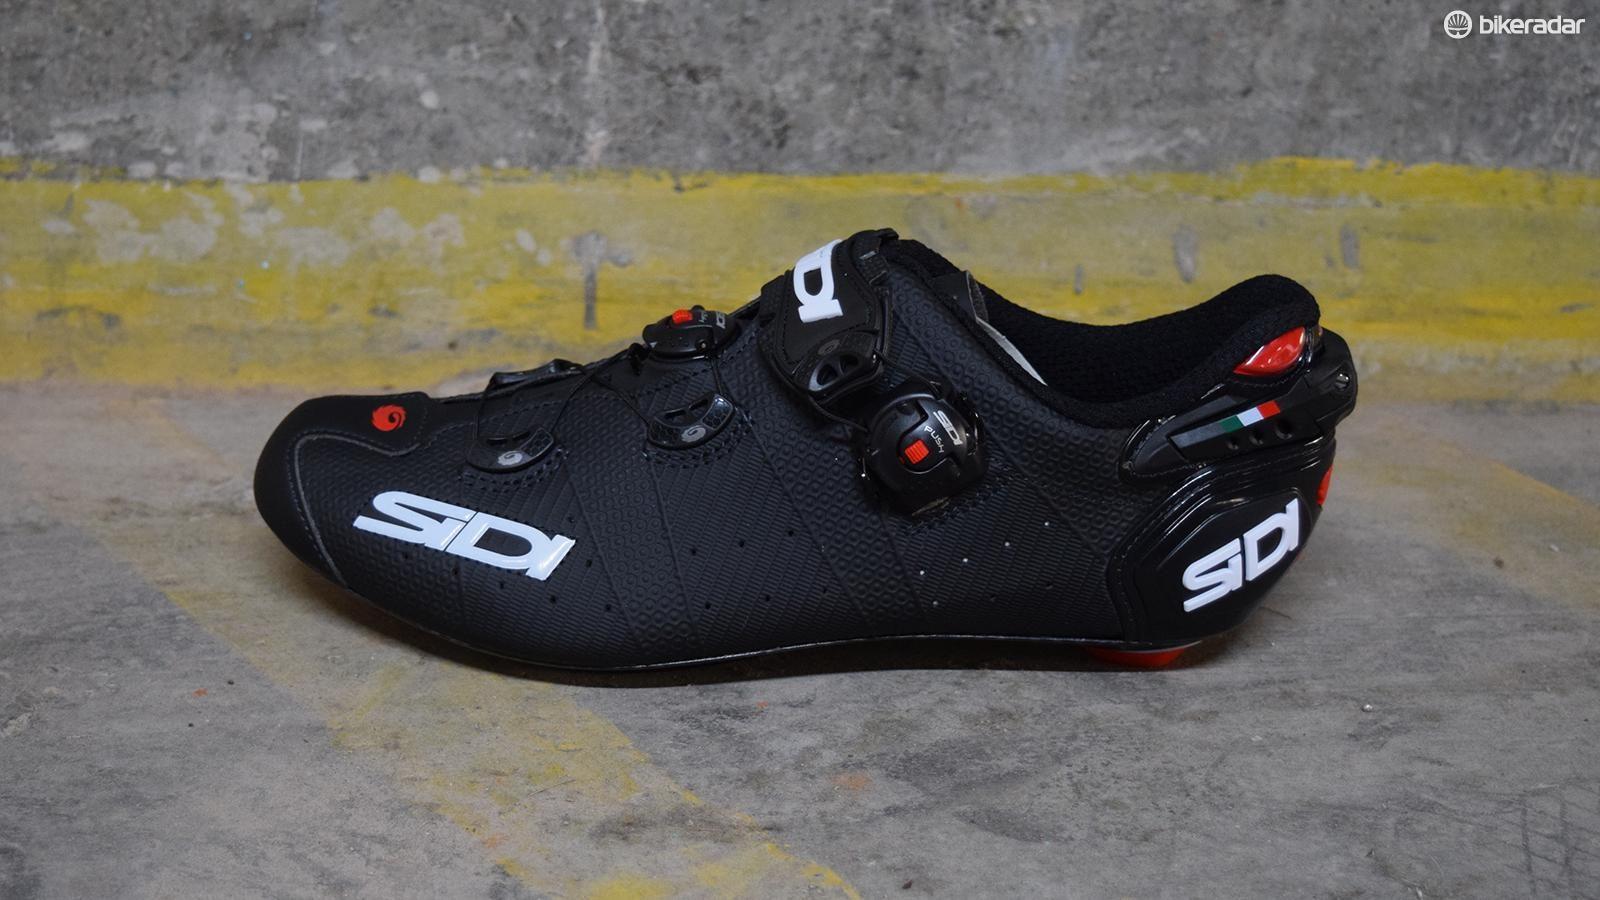 Sidi Wire 2 Carbon Matt road shoe first